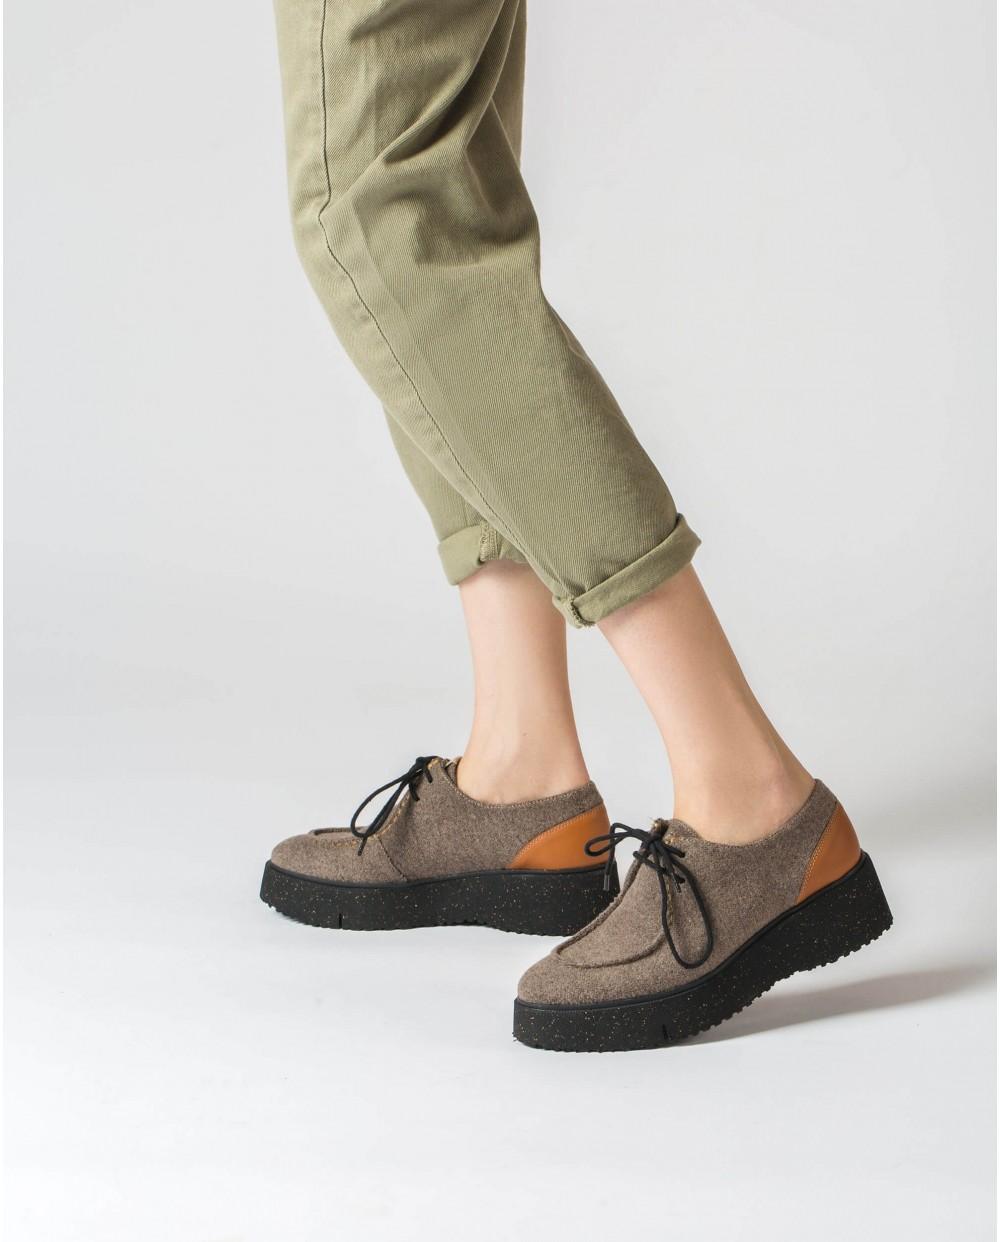 Wonders-Flat Shoes-Eco Walabee shoe